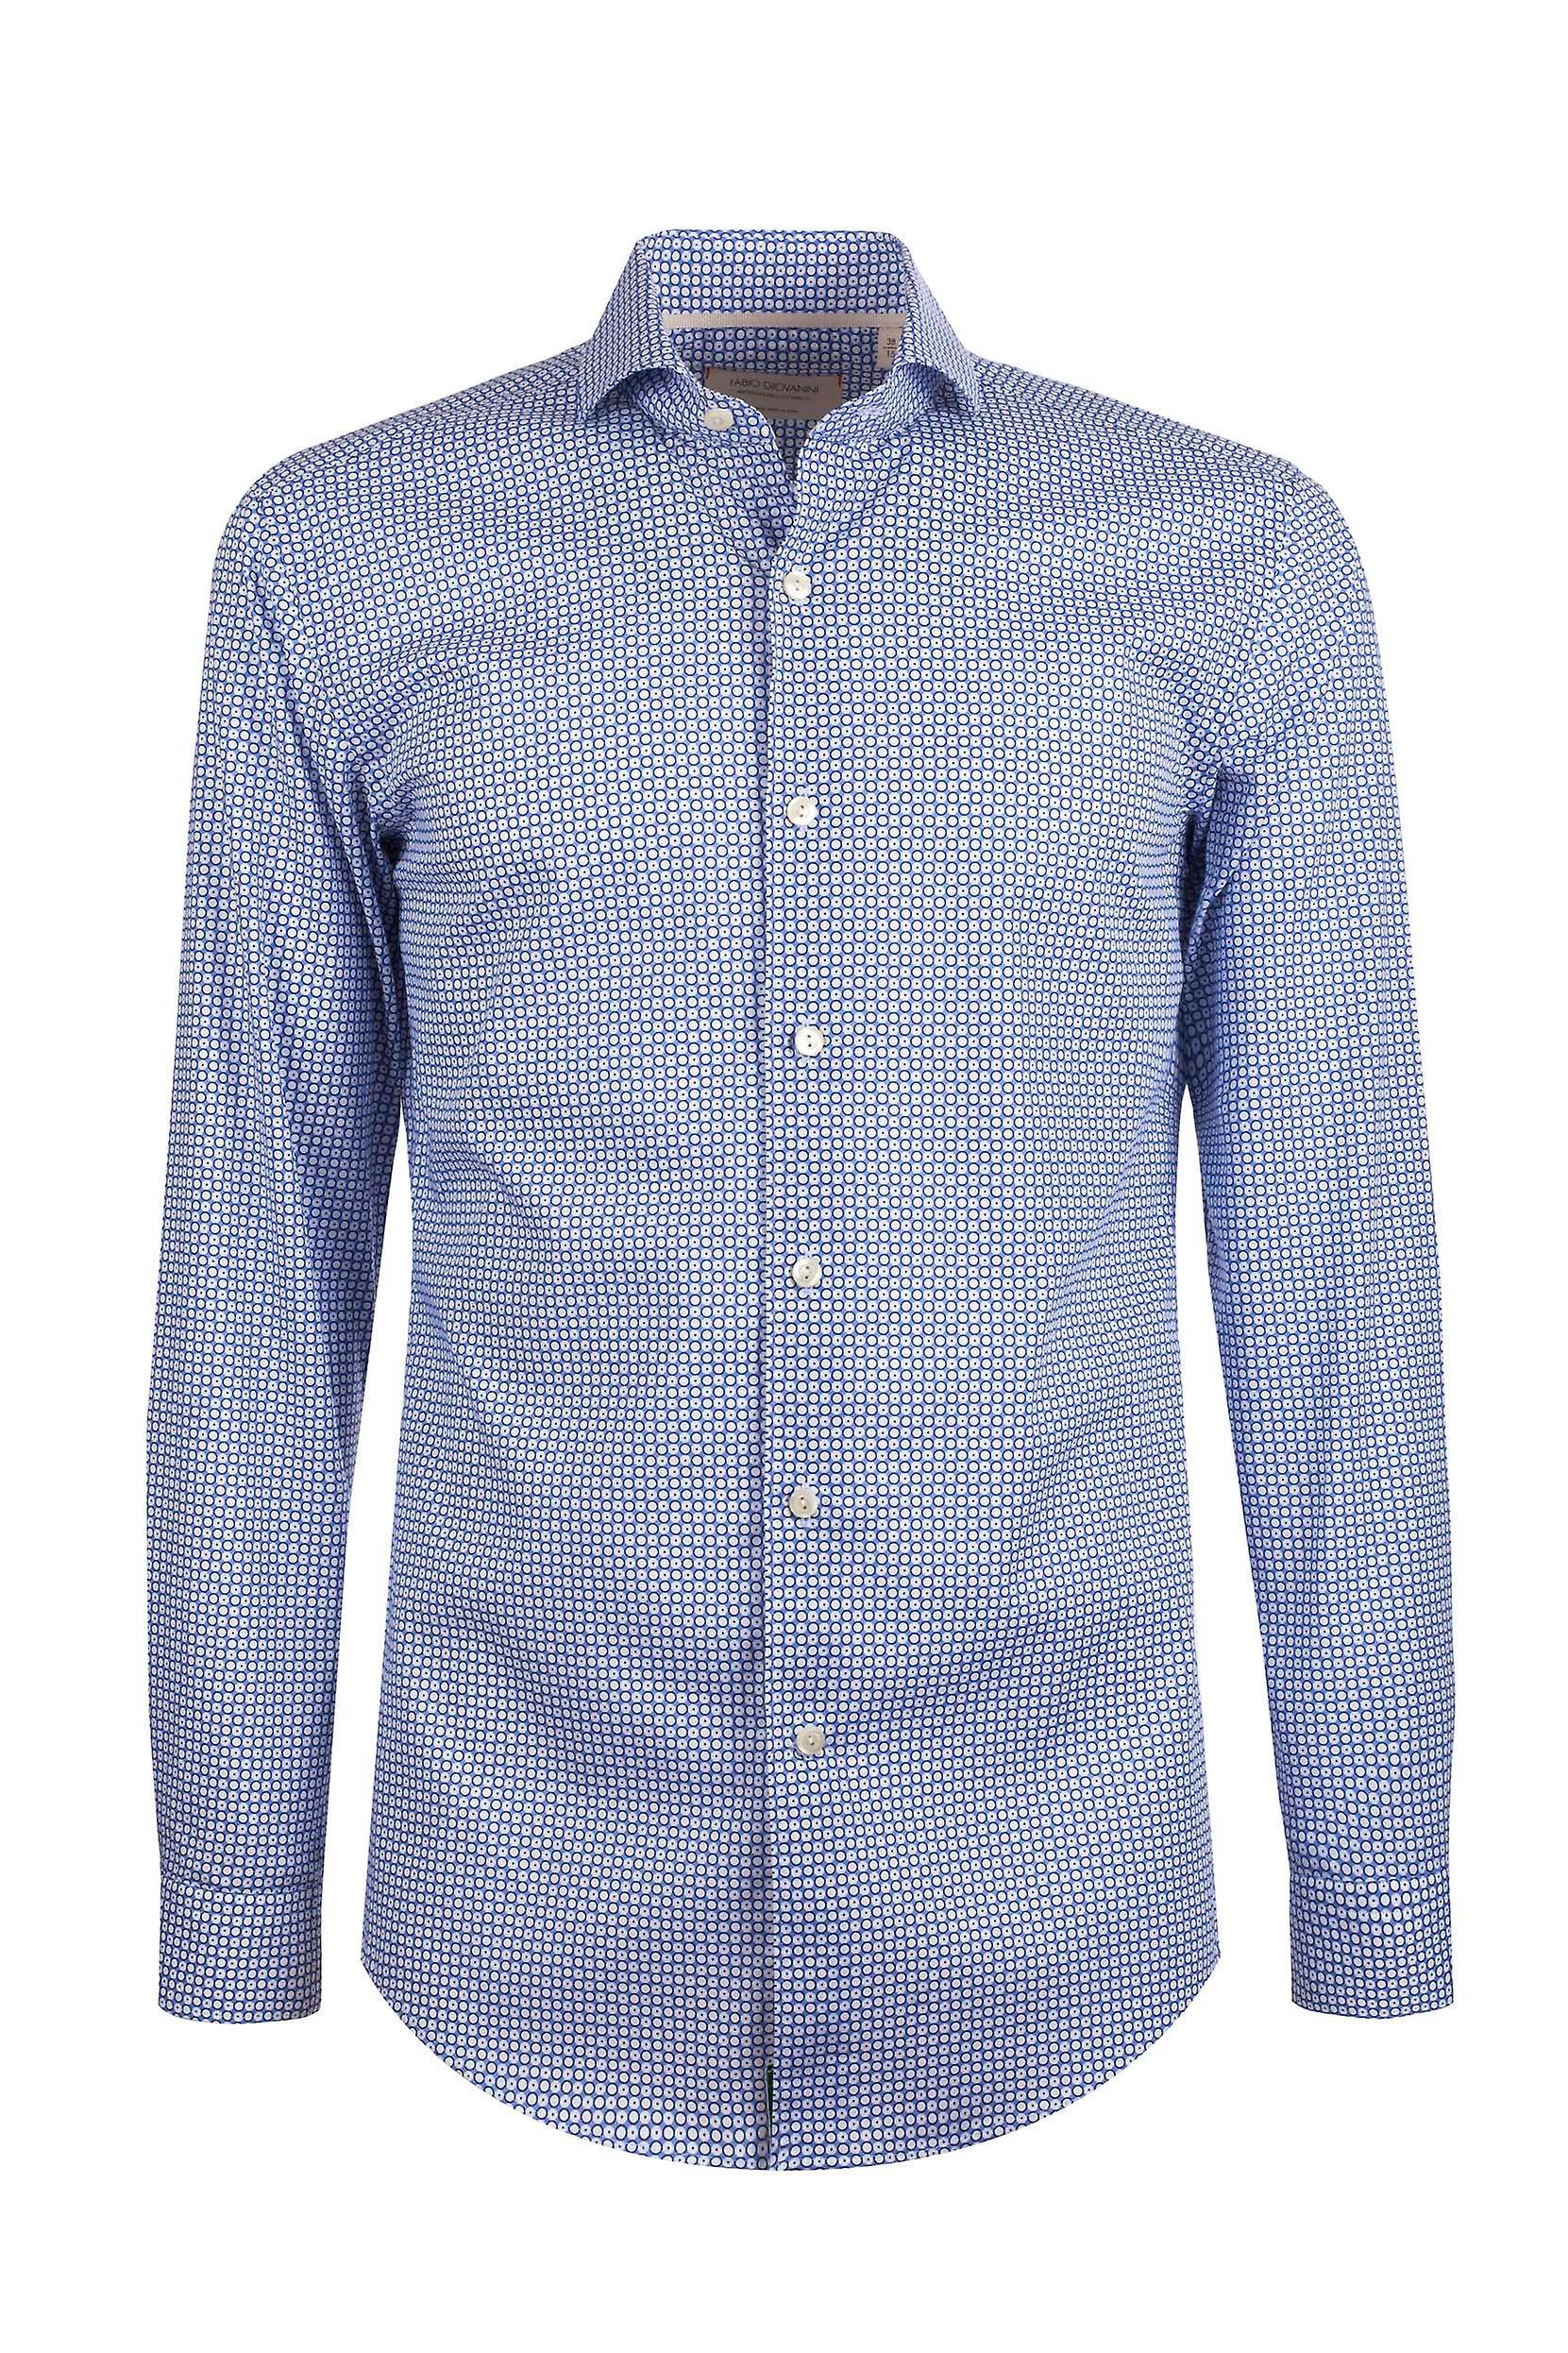 Fabio Giovanni San Lucia Shirt - Mens High Quality Italian Stretch Cotton Shirt